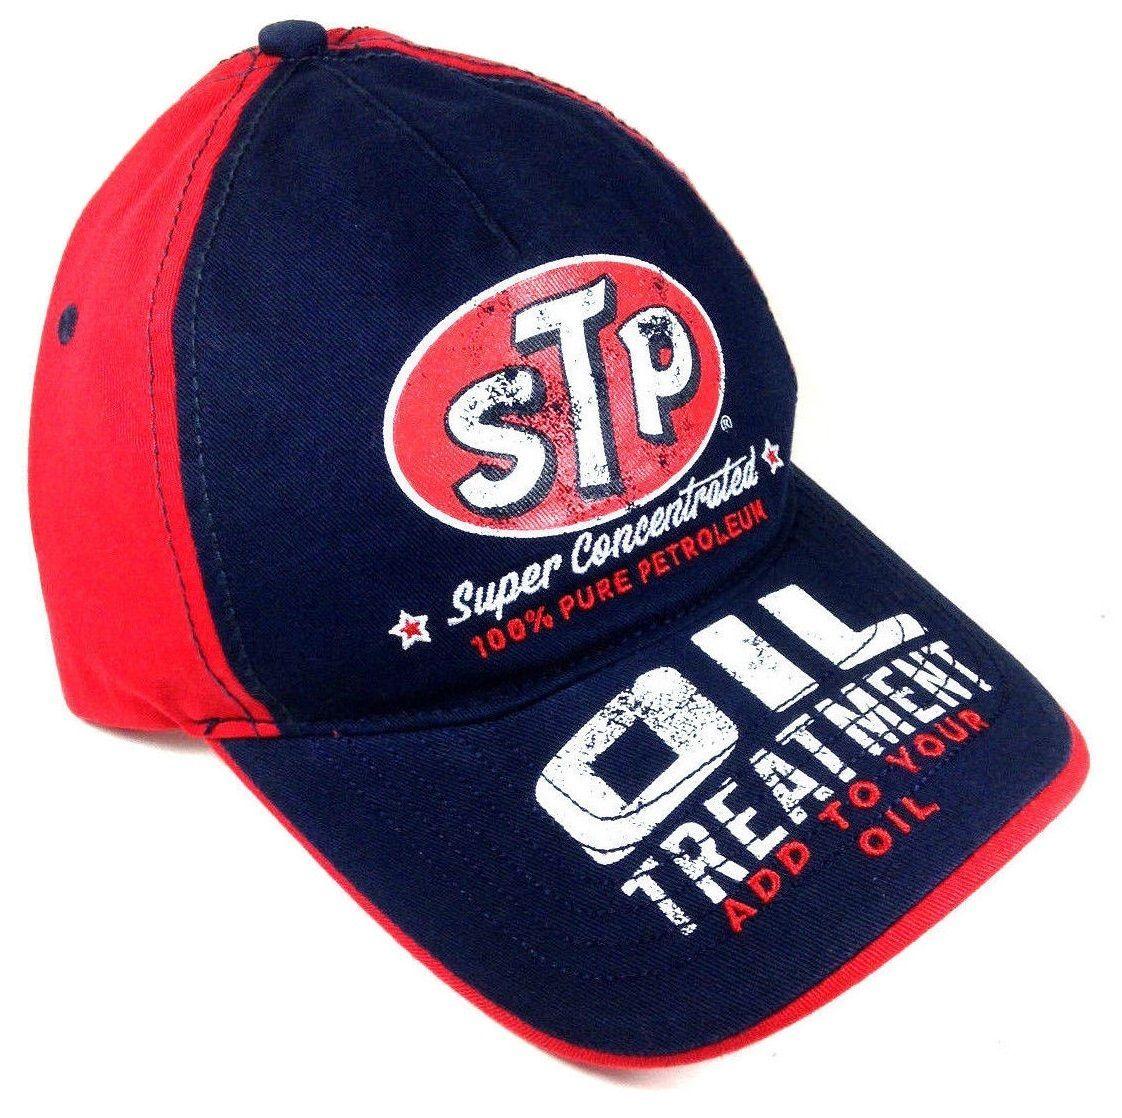 7b1ec944e02 Stp Motor Oil Logo Snapback Hat Cap Adjustable Curved Bill Red Blue Retro  Faded